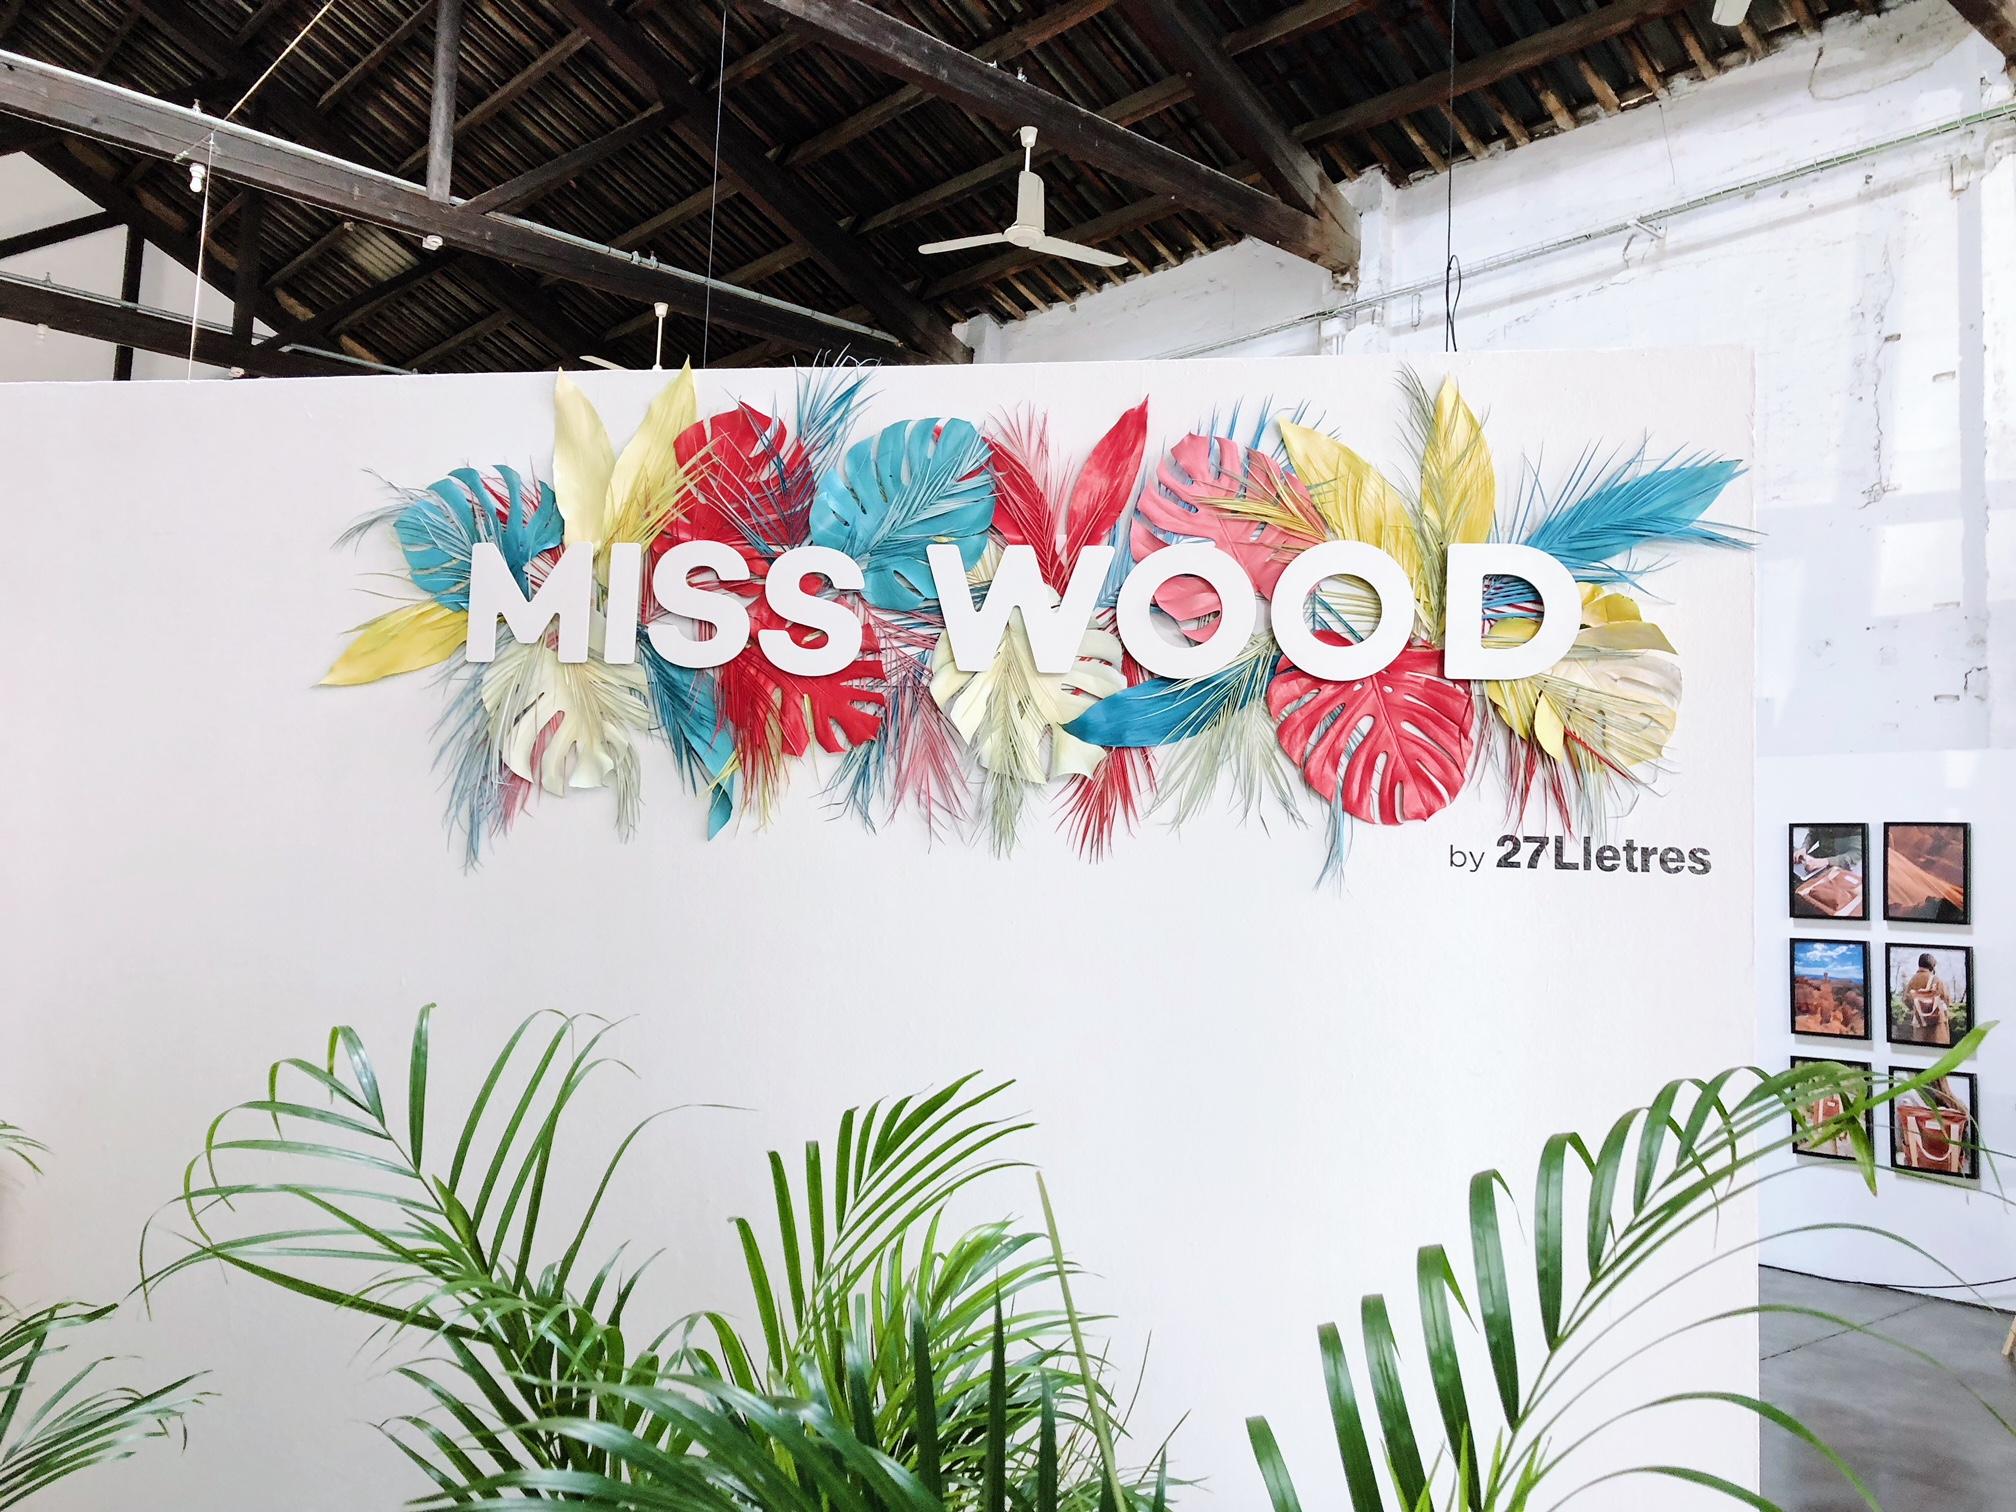 misswood-eventos-27lletres-05.JPG